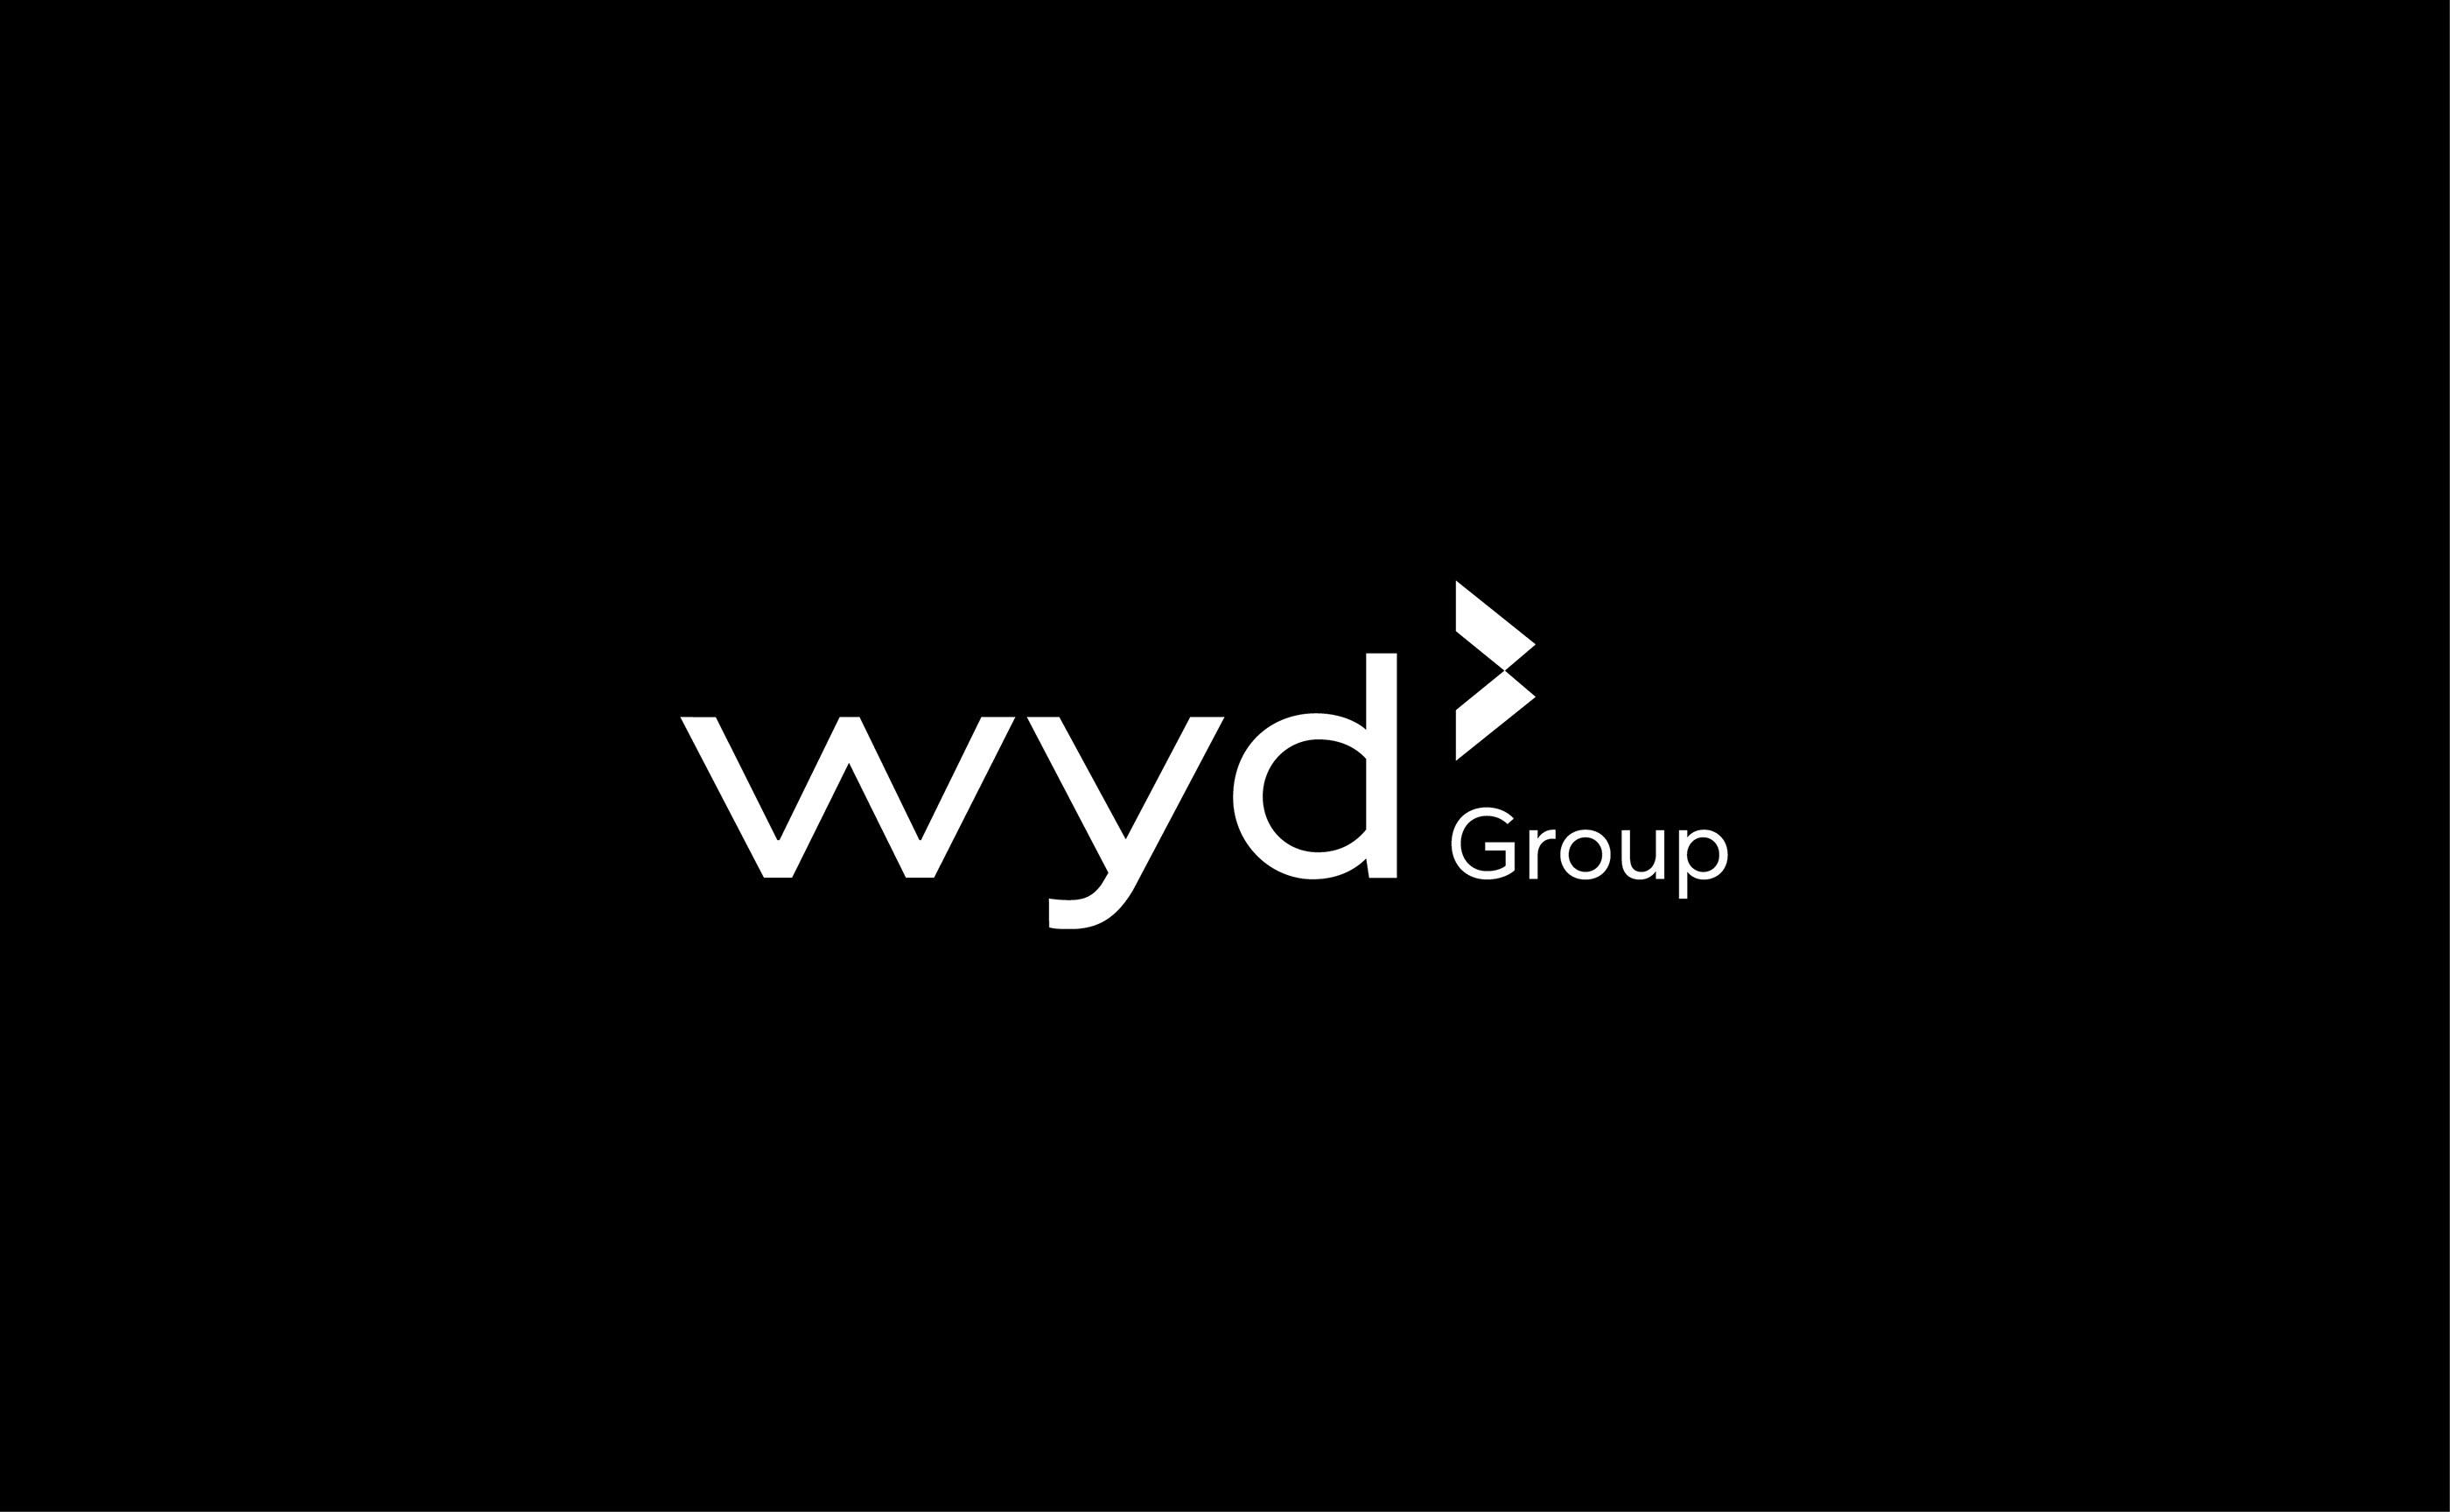 Wyd集团LOGO设计